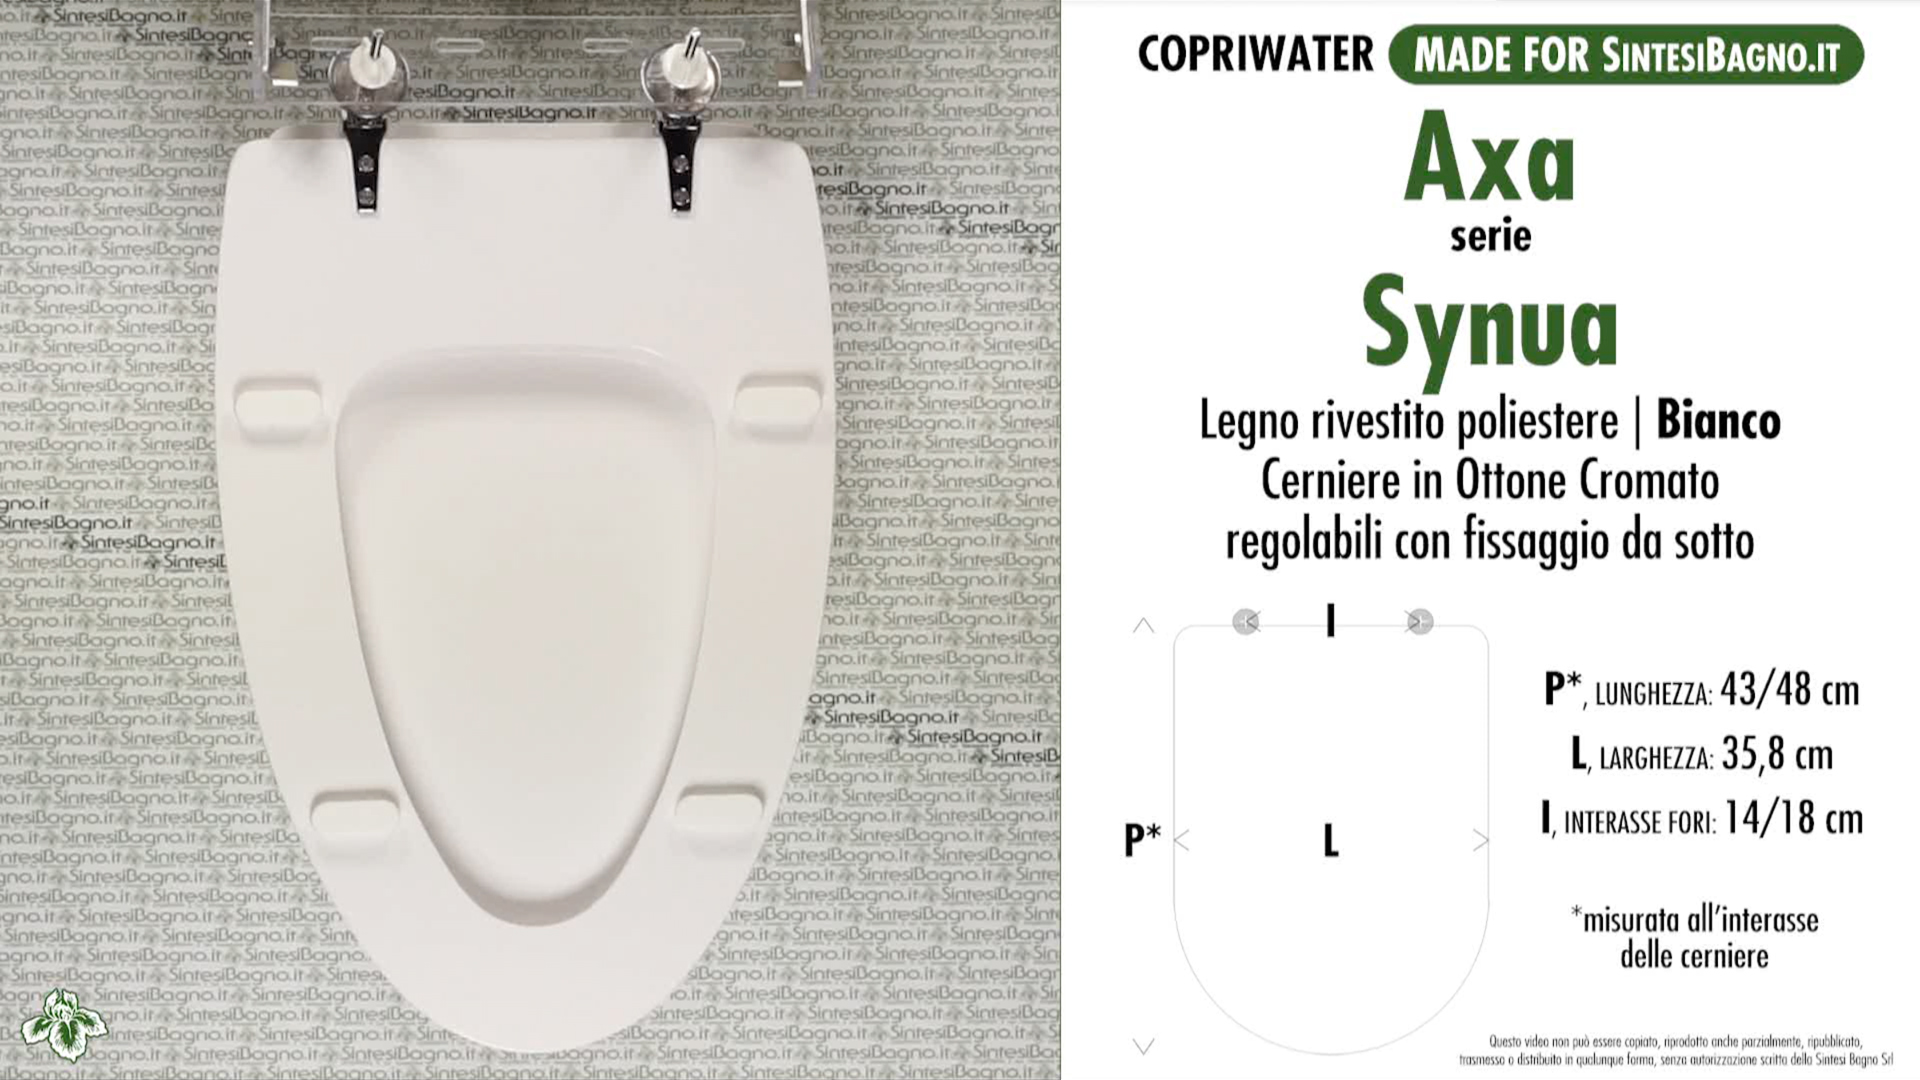 SCHEDA TECNICA MISURE copriwater AXA SYNUA